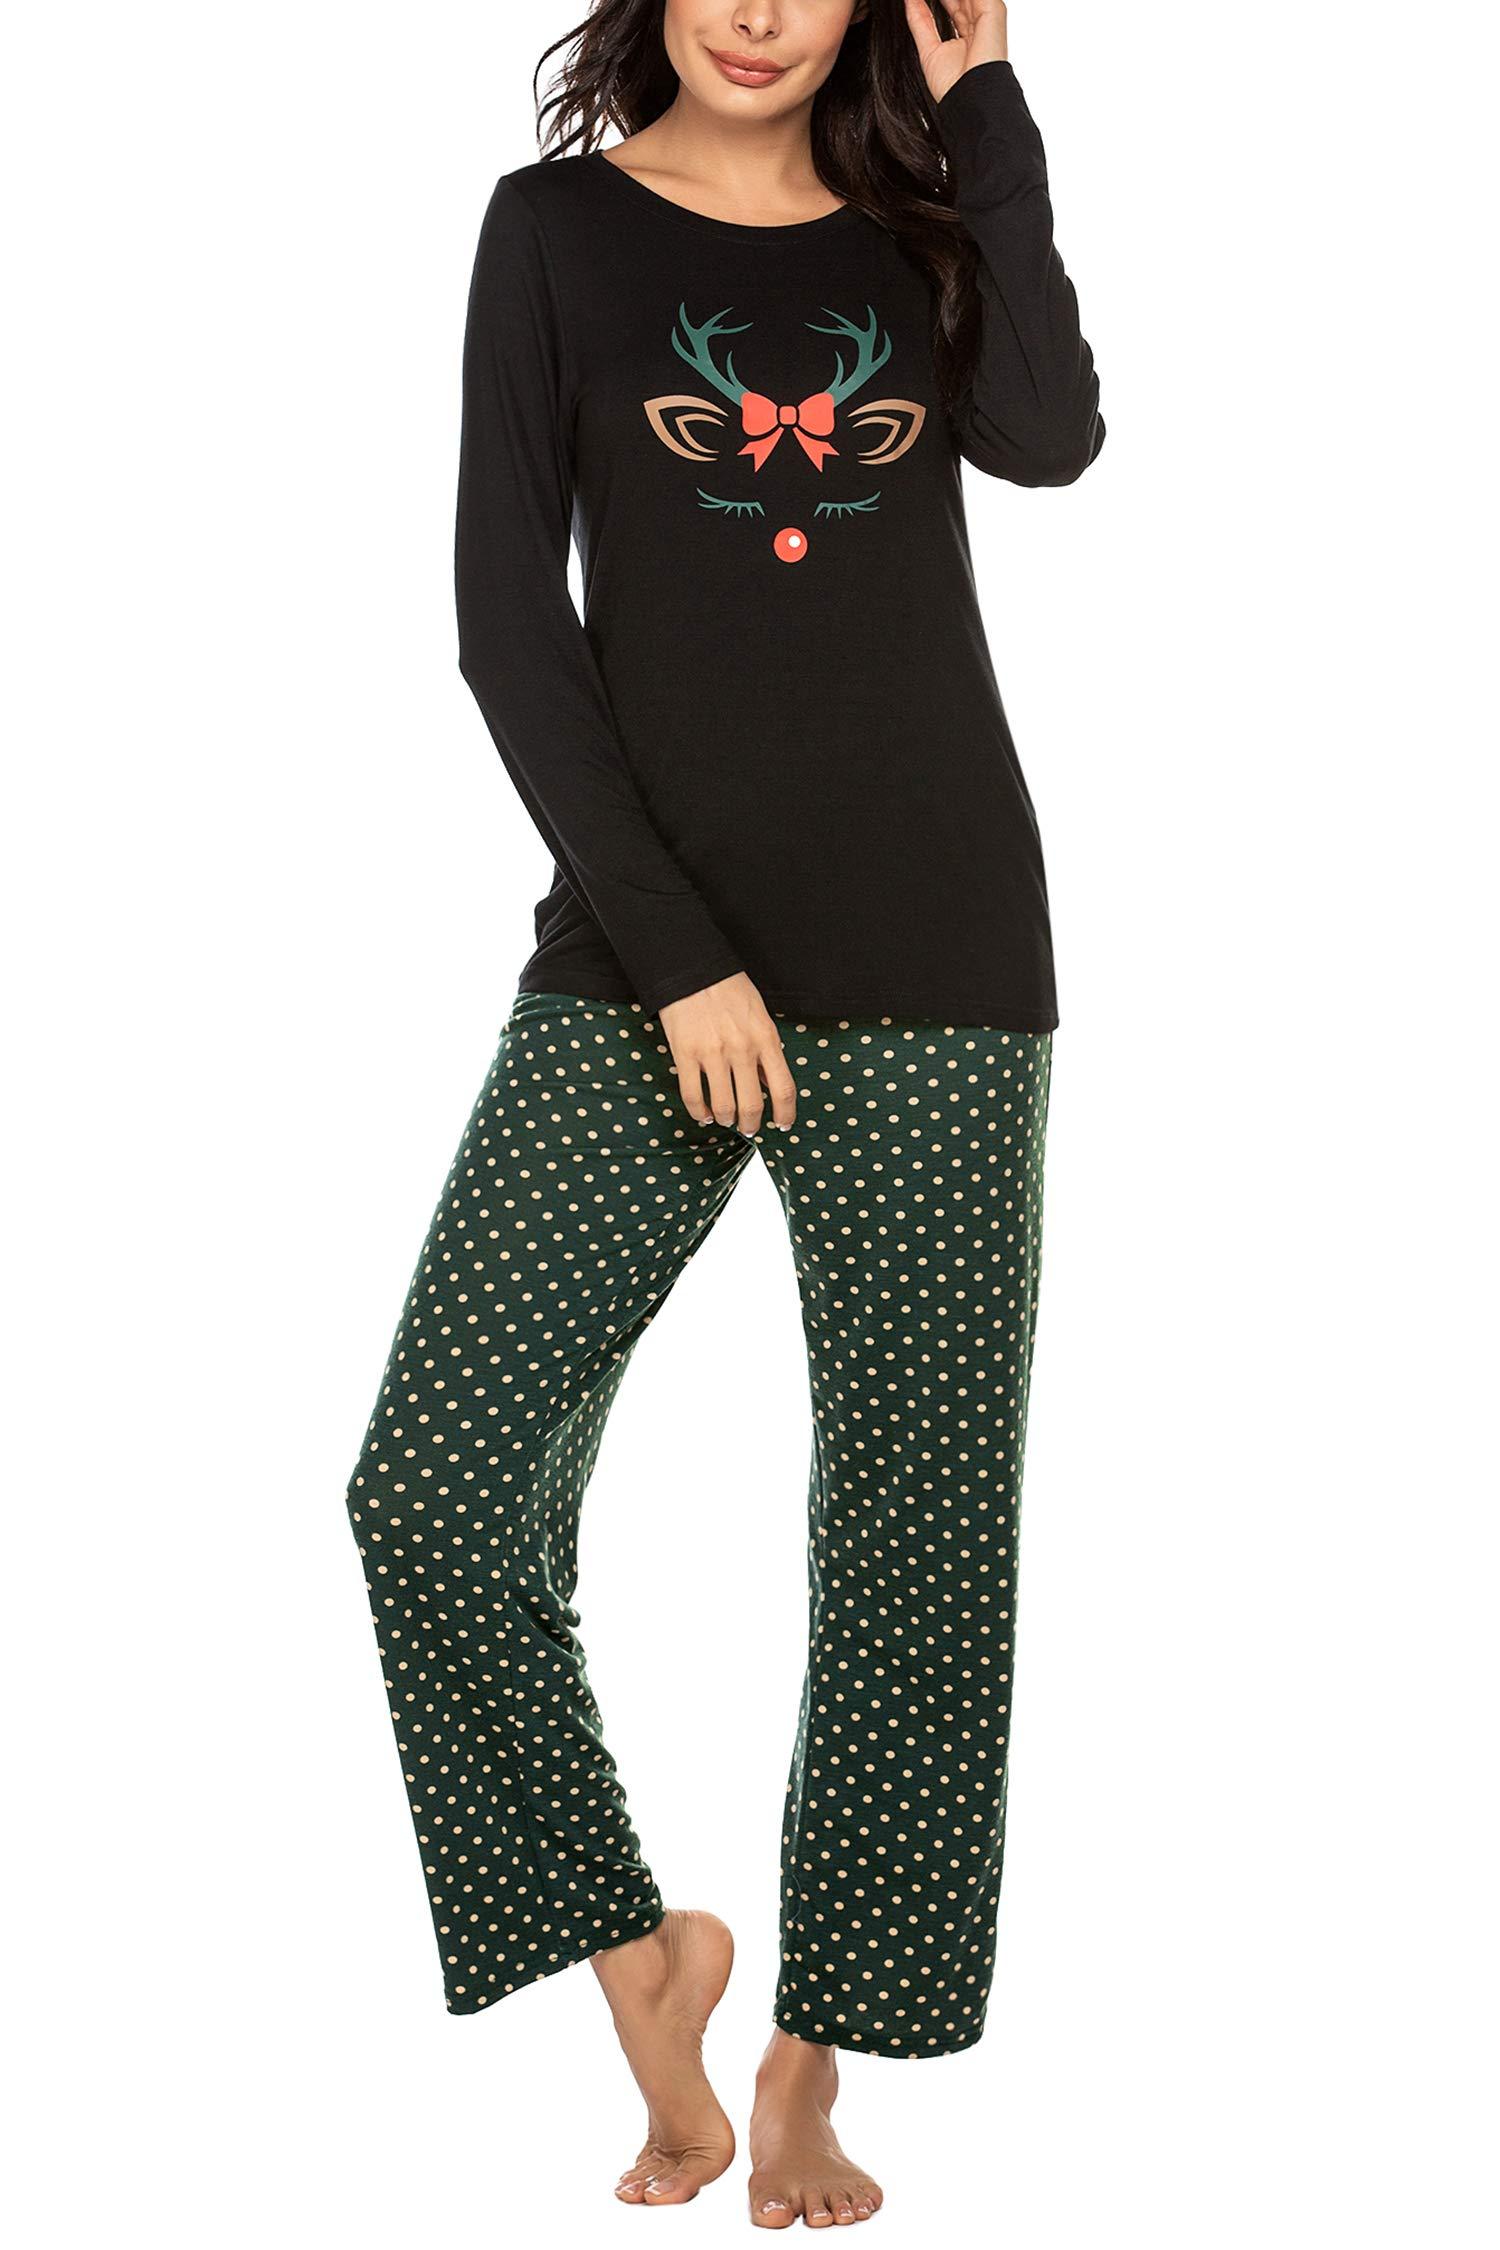 Ekouaer Women's Pajama Set Long Sleeve Sleepwear Polka Dots Printed Pjs Set Cute Pajamas for Women S-XXL